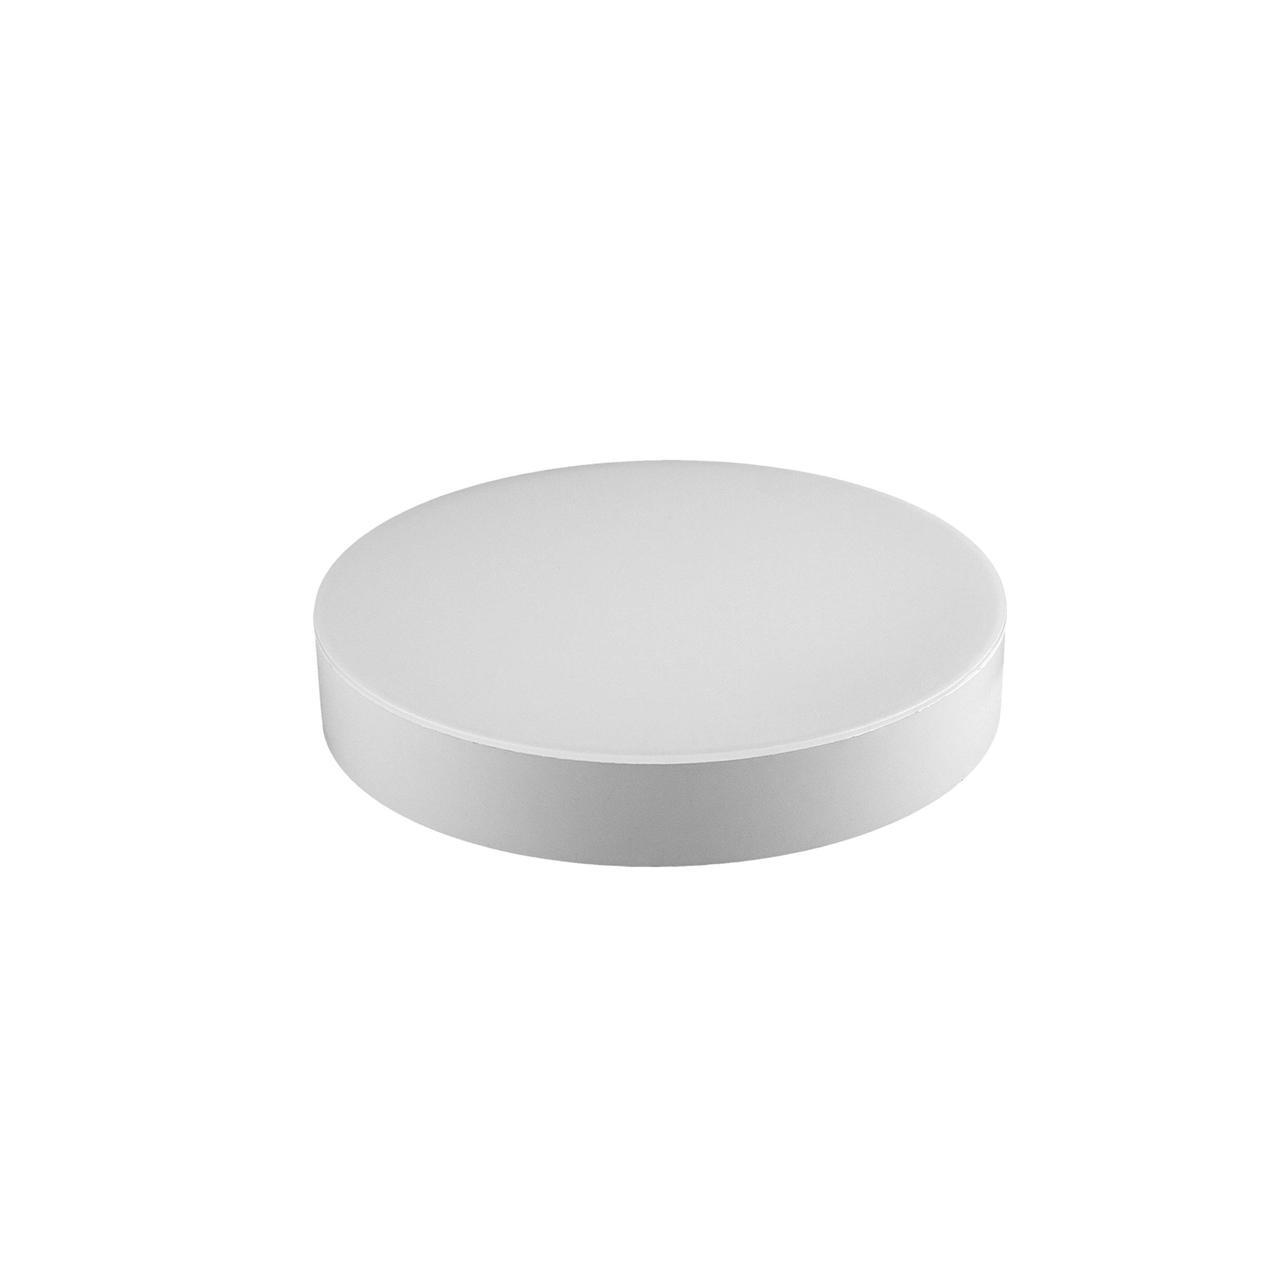 Led светильник накладной таблетка круг белый PC0024-32HSF RD 24W 6000К